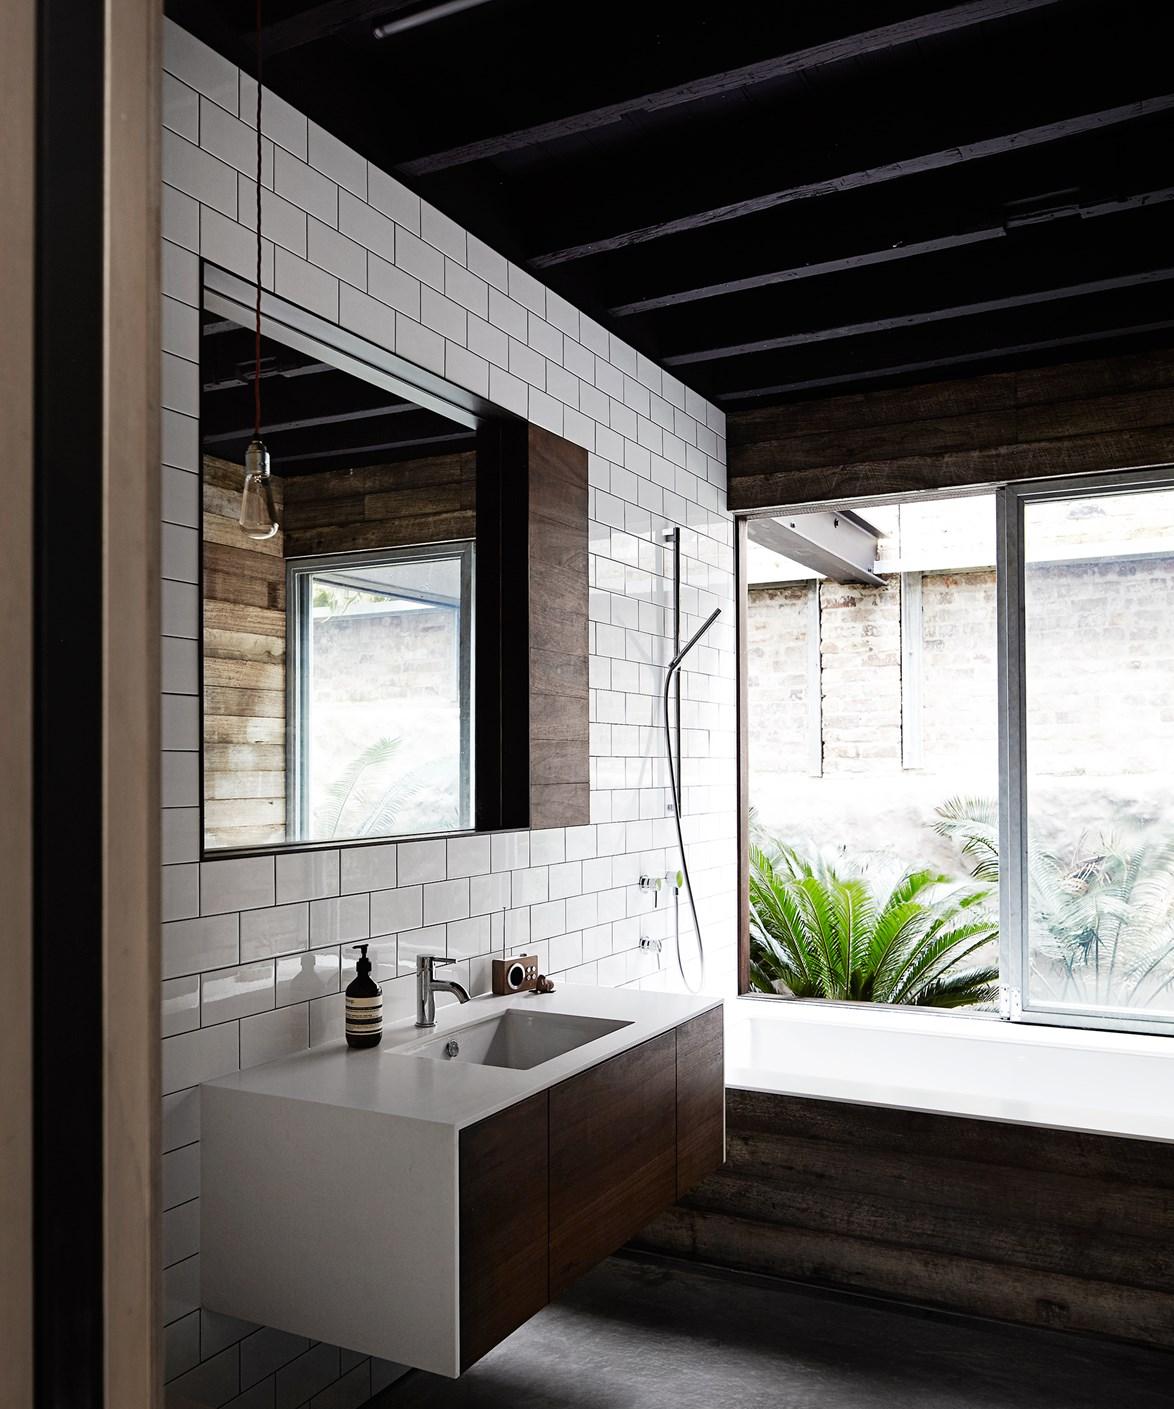 "[Comedian Merrick Watt's bathroom](https://www.homestolove.com.au/inside-comedian-merrick-watts-happy-home-3465 target=""_blank"") is no laughing matter with it's sleek, mid-century vibe. Photo: Sharyn Cairns / *real living*"